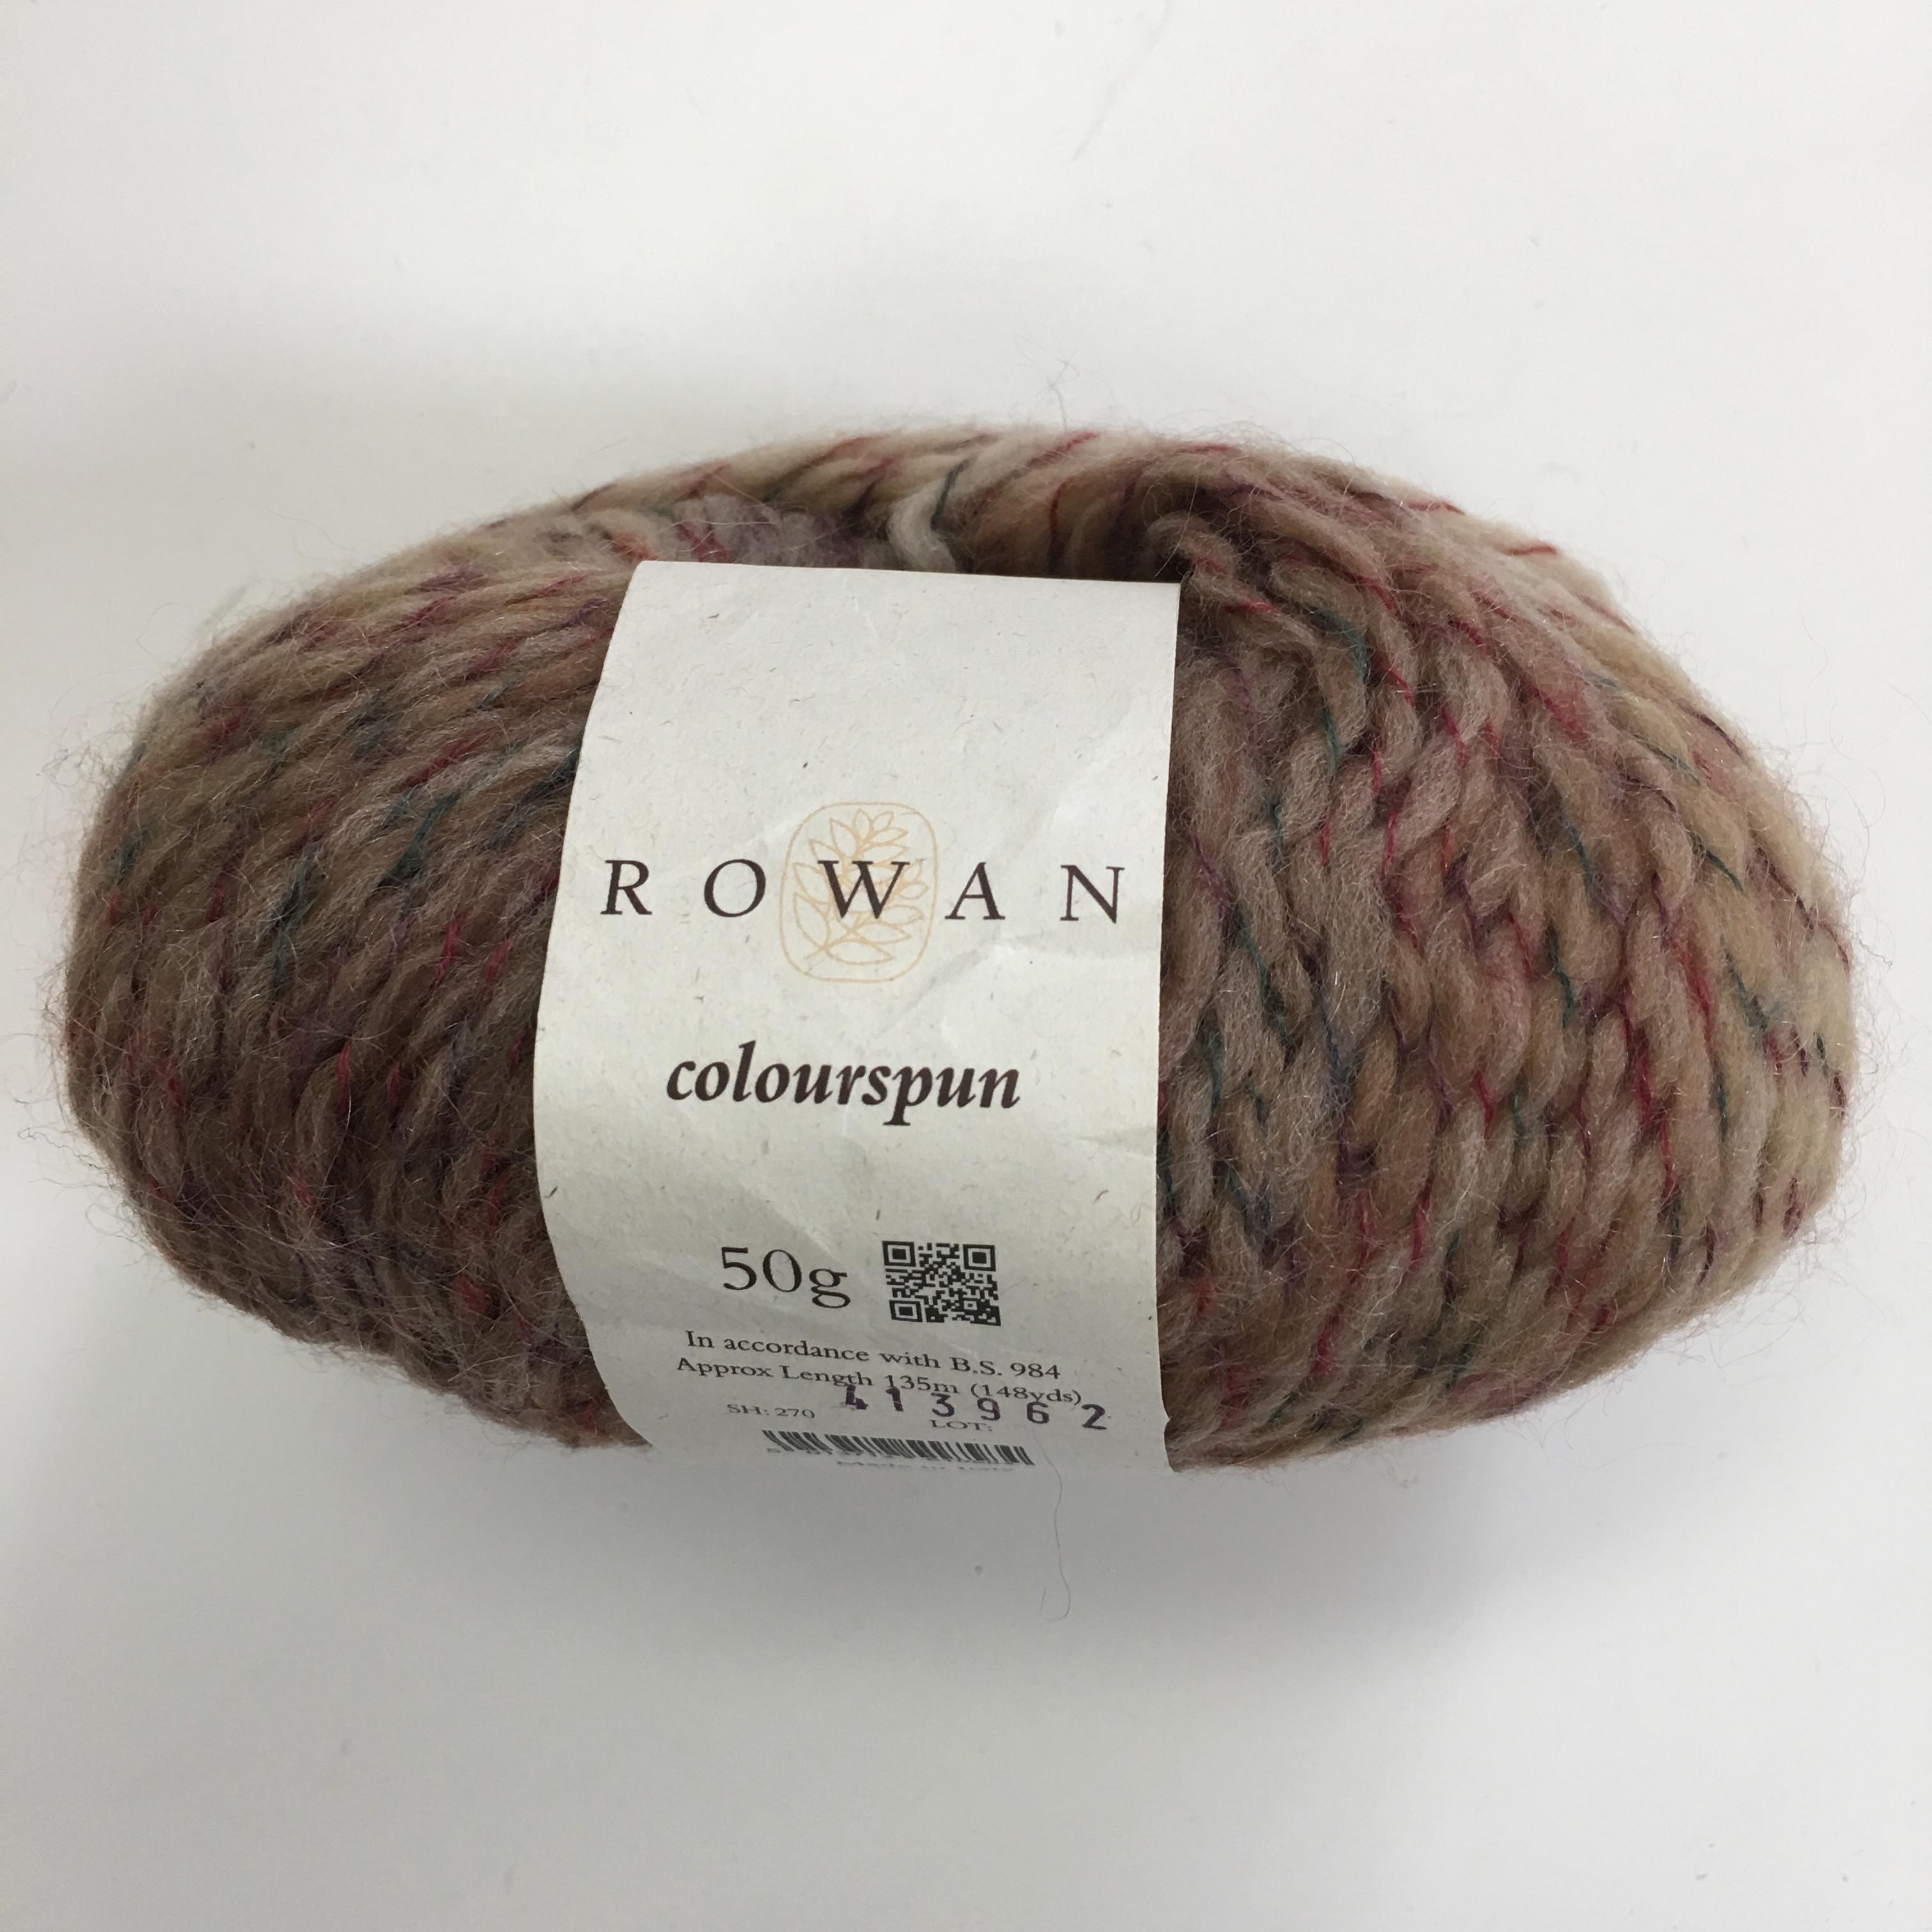 Rowan|Colourspun